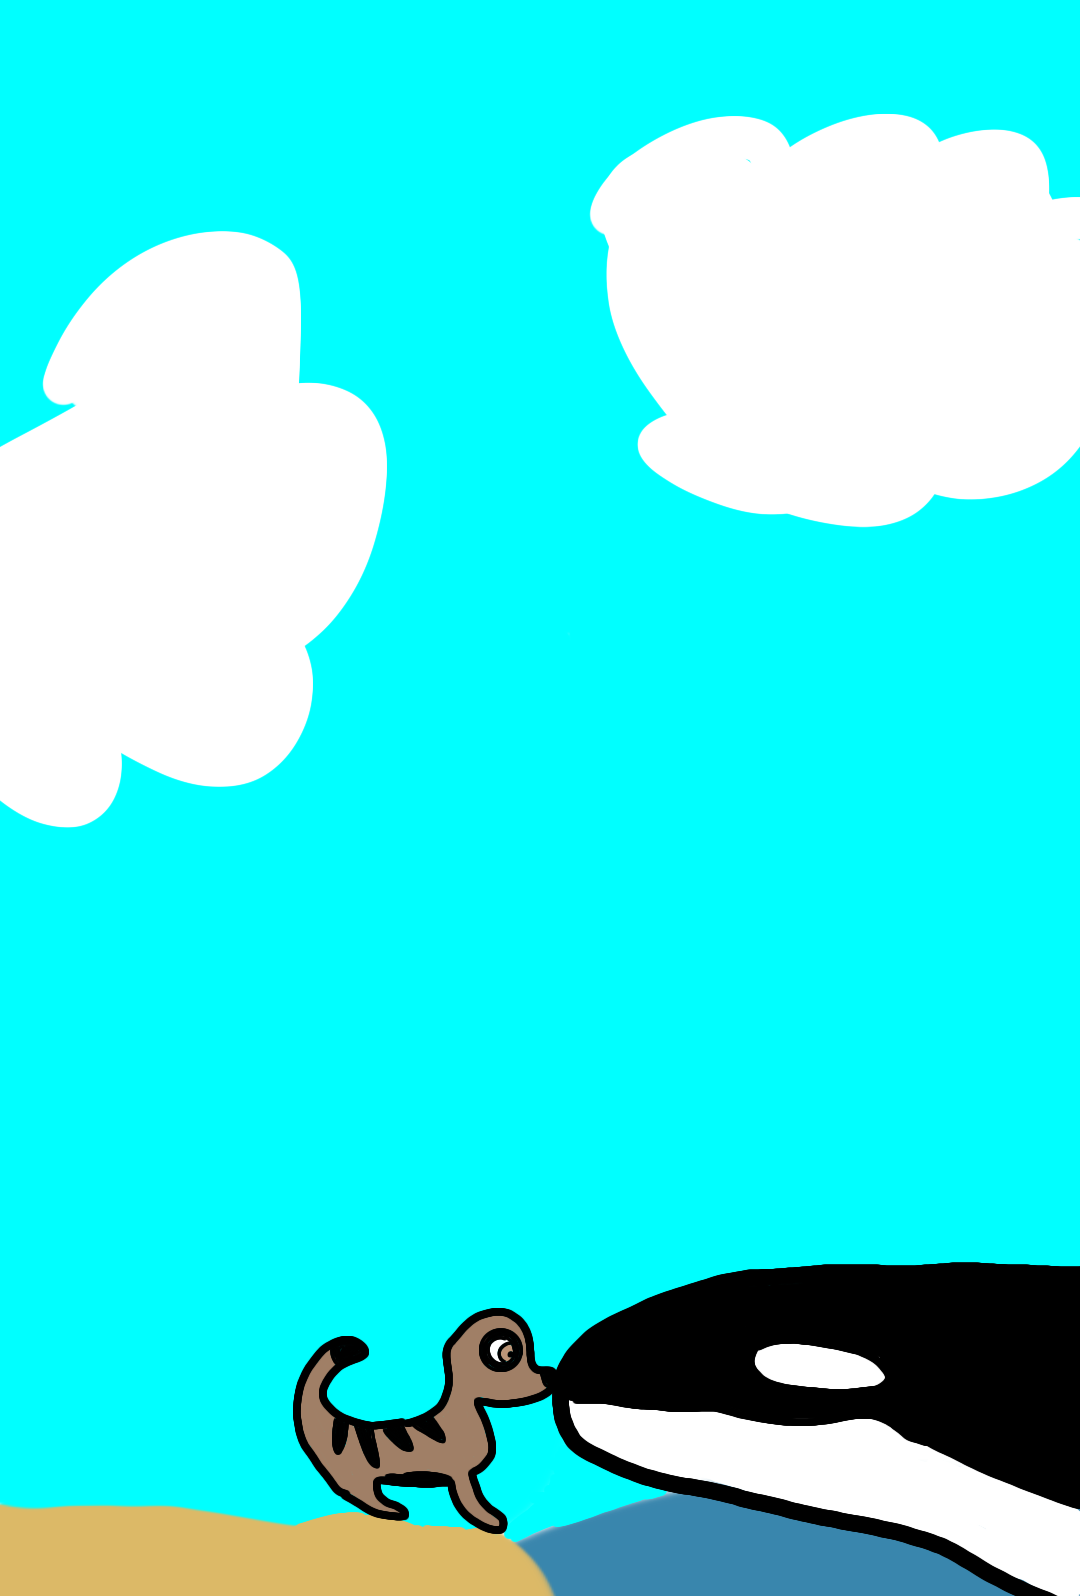 Meerkat and Orca